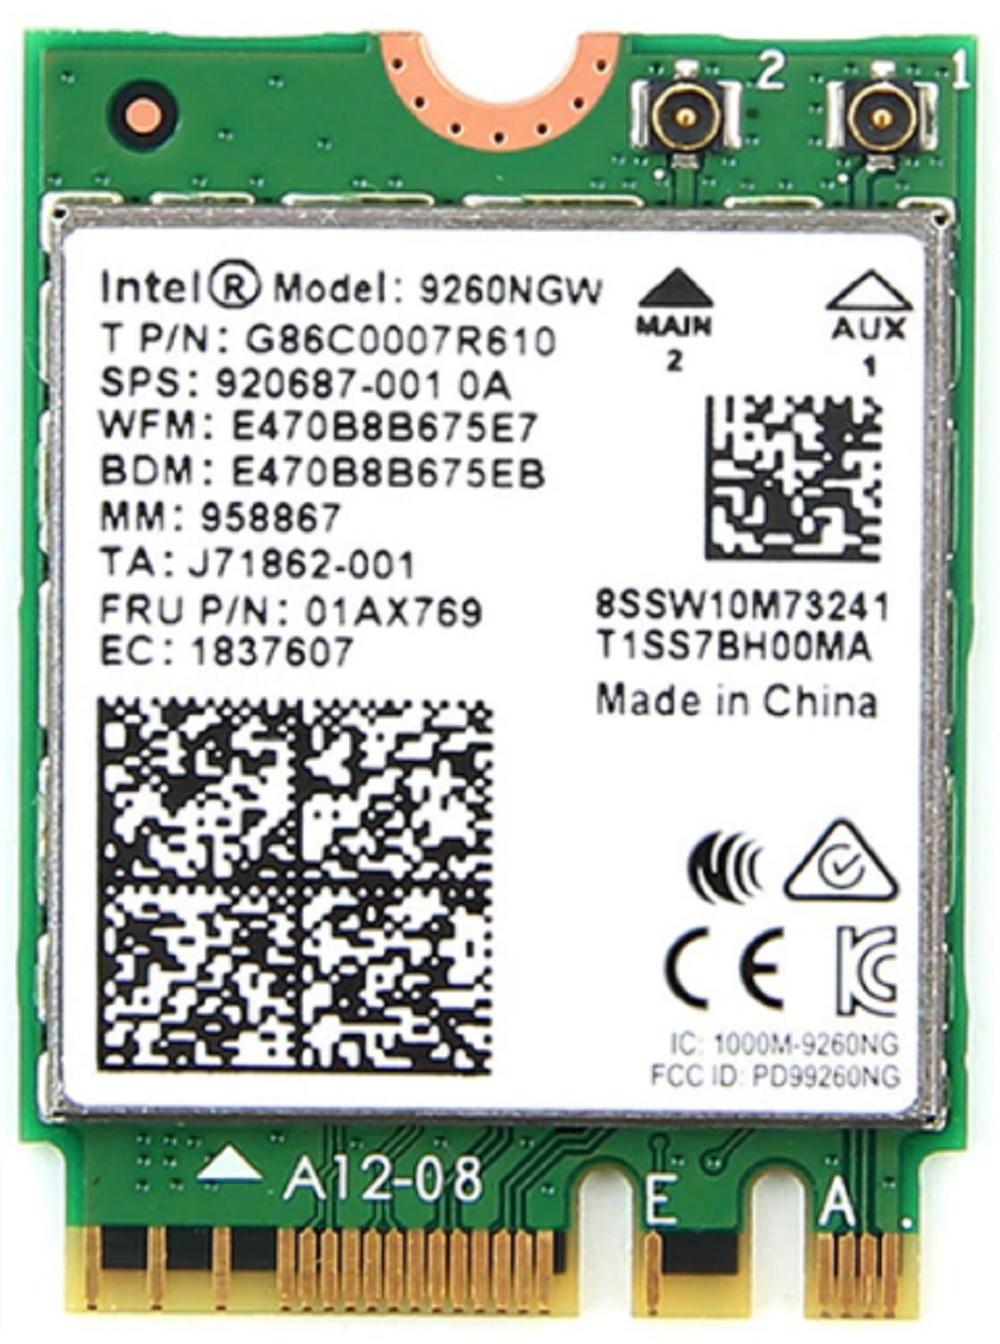 intel Wi-Fi 5 bluetooth 1733Mbps ですが AX200 より安価です インテル Intel 9260 NGW 802.11AC NGFF 超激得SALE パソコン 子機 アップグレード ノート + Bluetooth note m2 気質アップ M.2 m.2 ワイヤレスカード